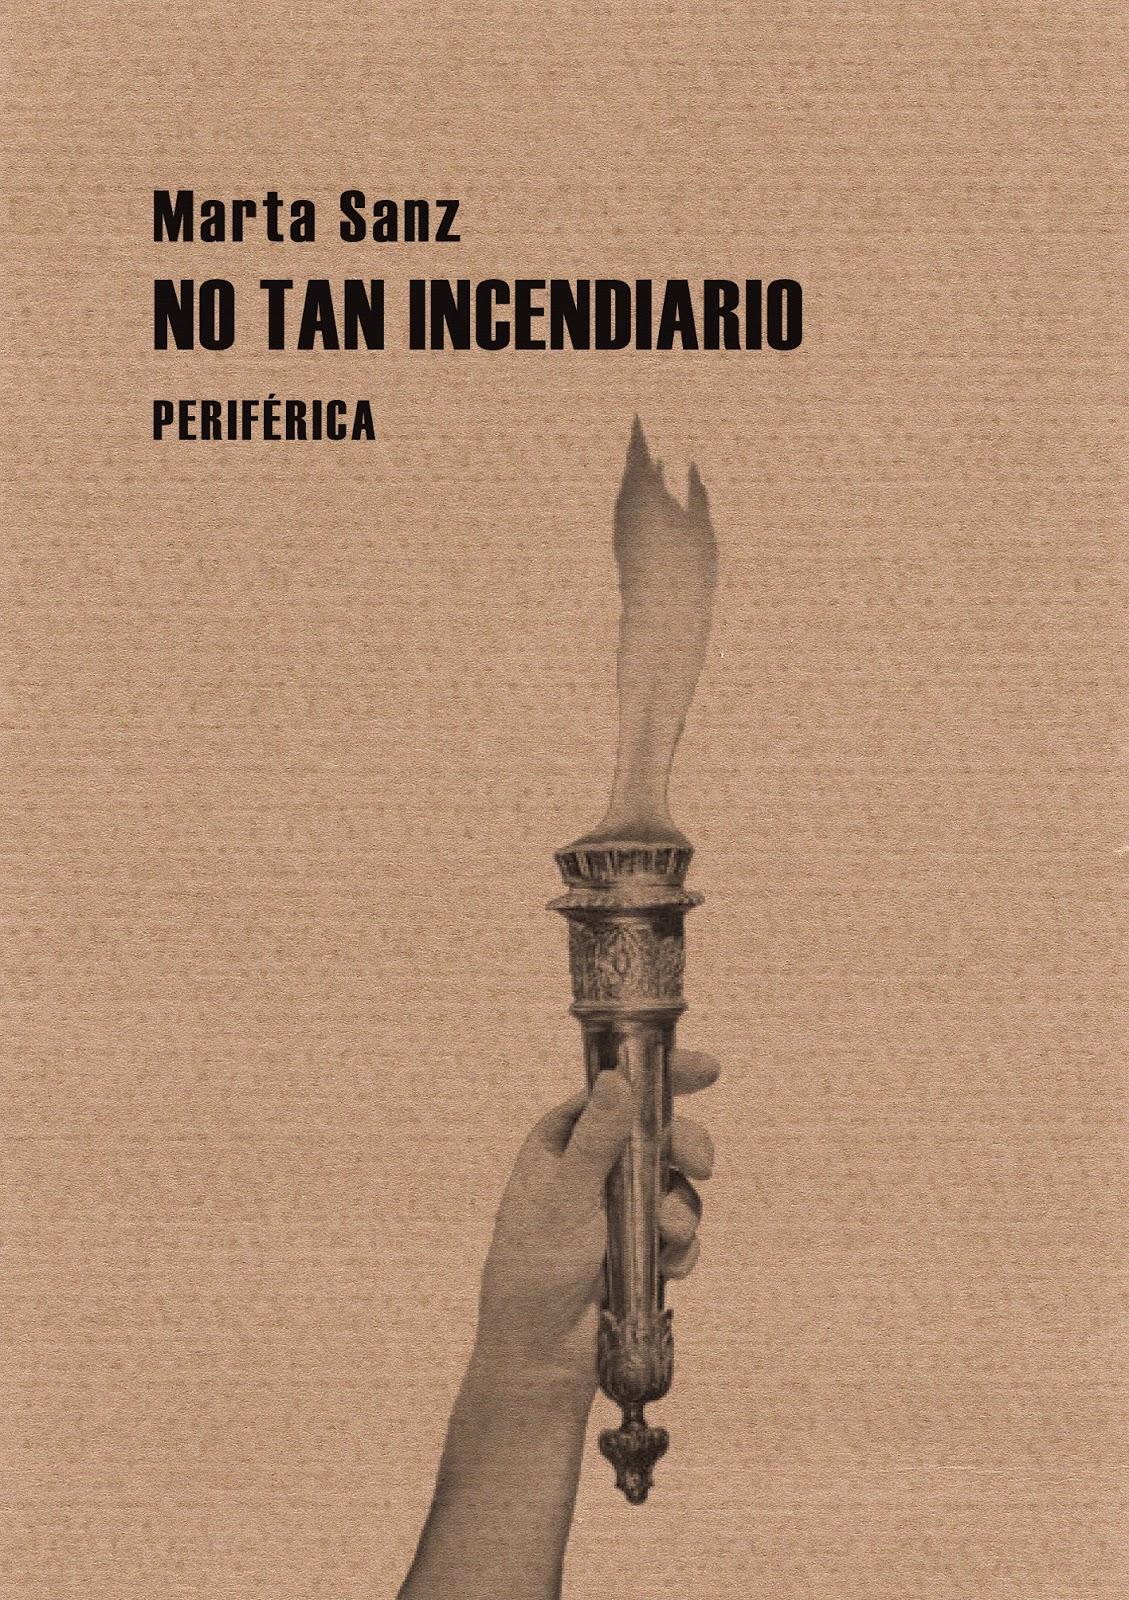 http://juntandomasletras.blogspot.com.es/2014/09/no-tan-incendiario-de-marta-sanz-sobre.html